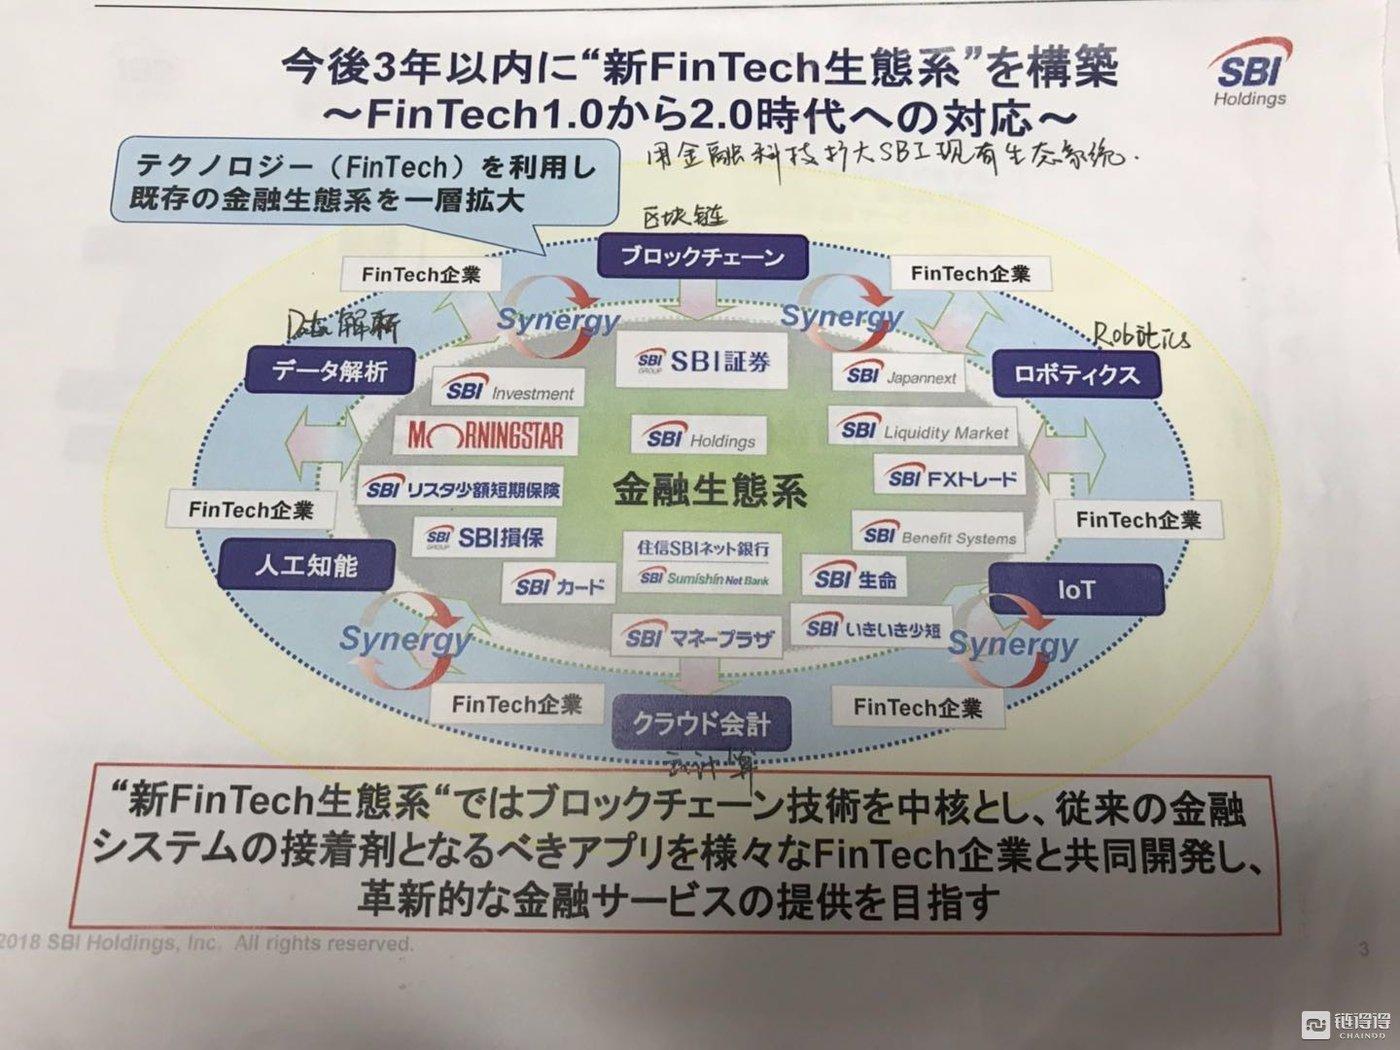 SBI借力Fin Tech扩大现有金融体系(日语翻译为手写)